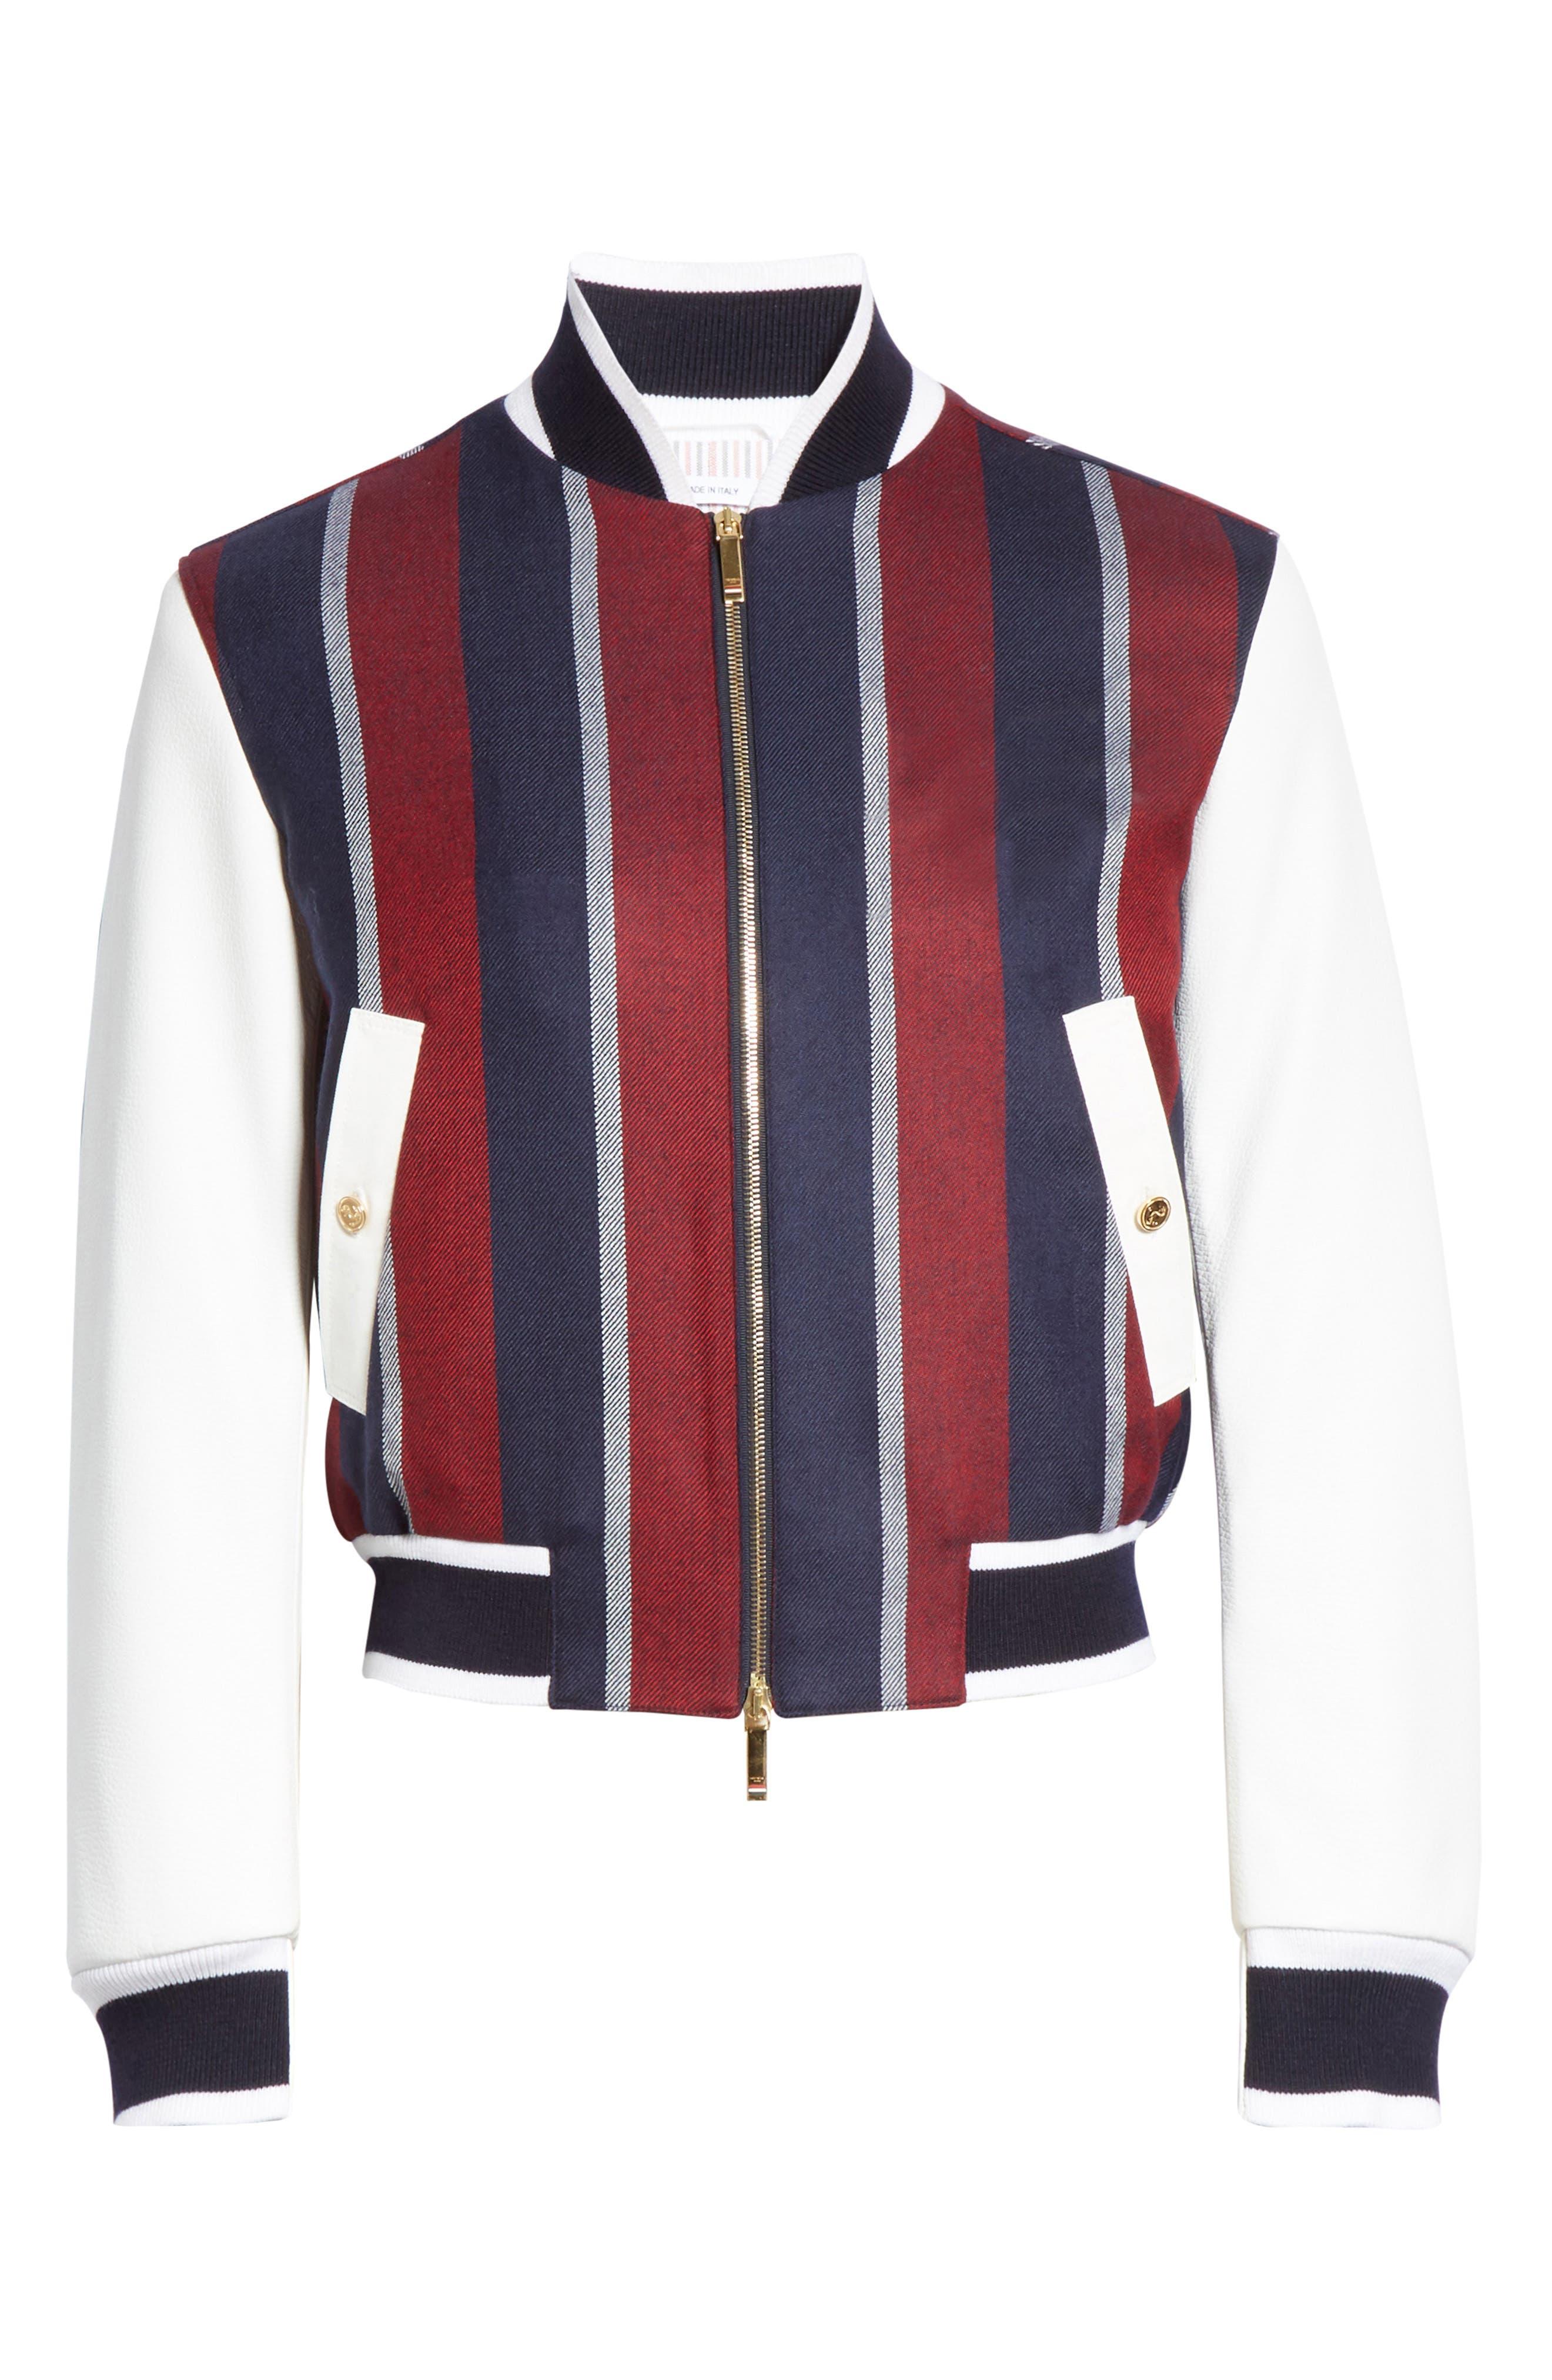 Men's Thom Browne Clothing | Nordstrom